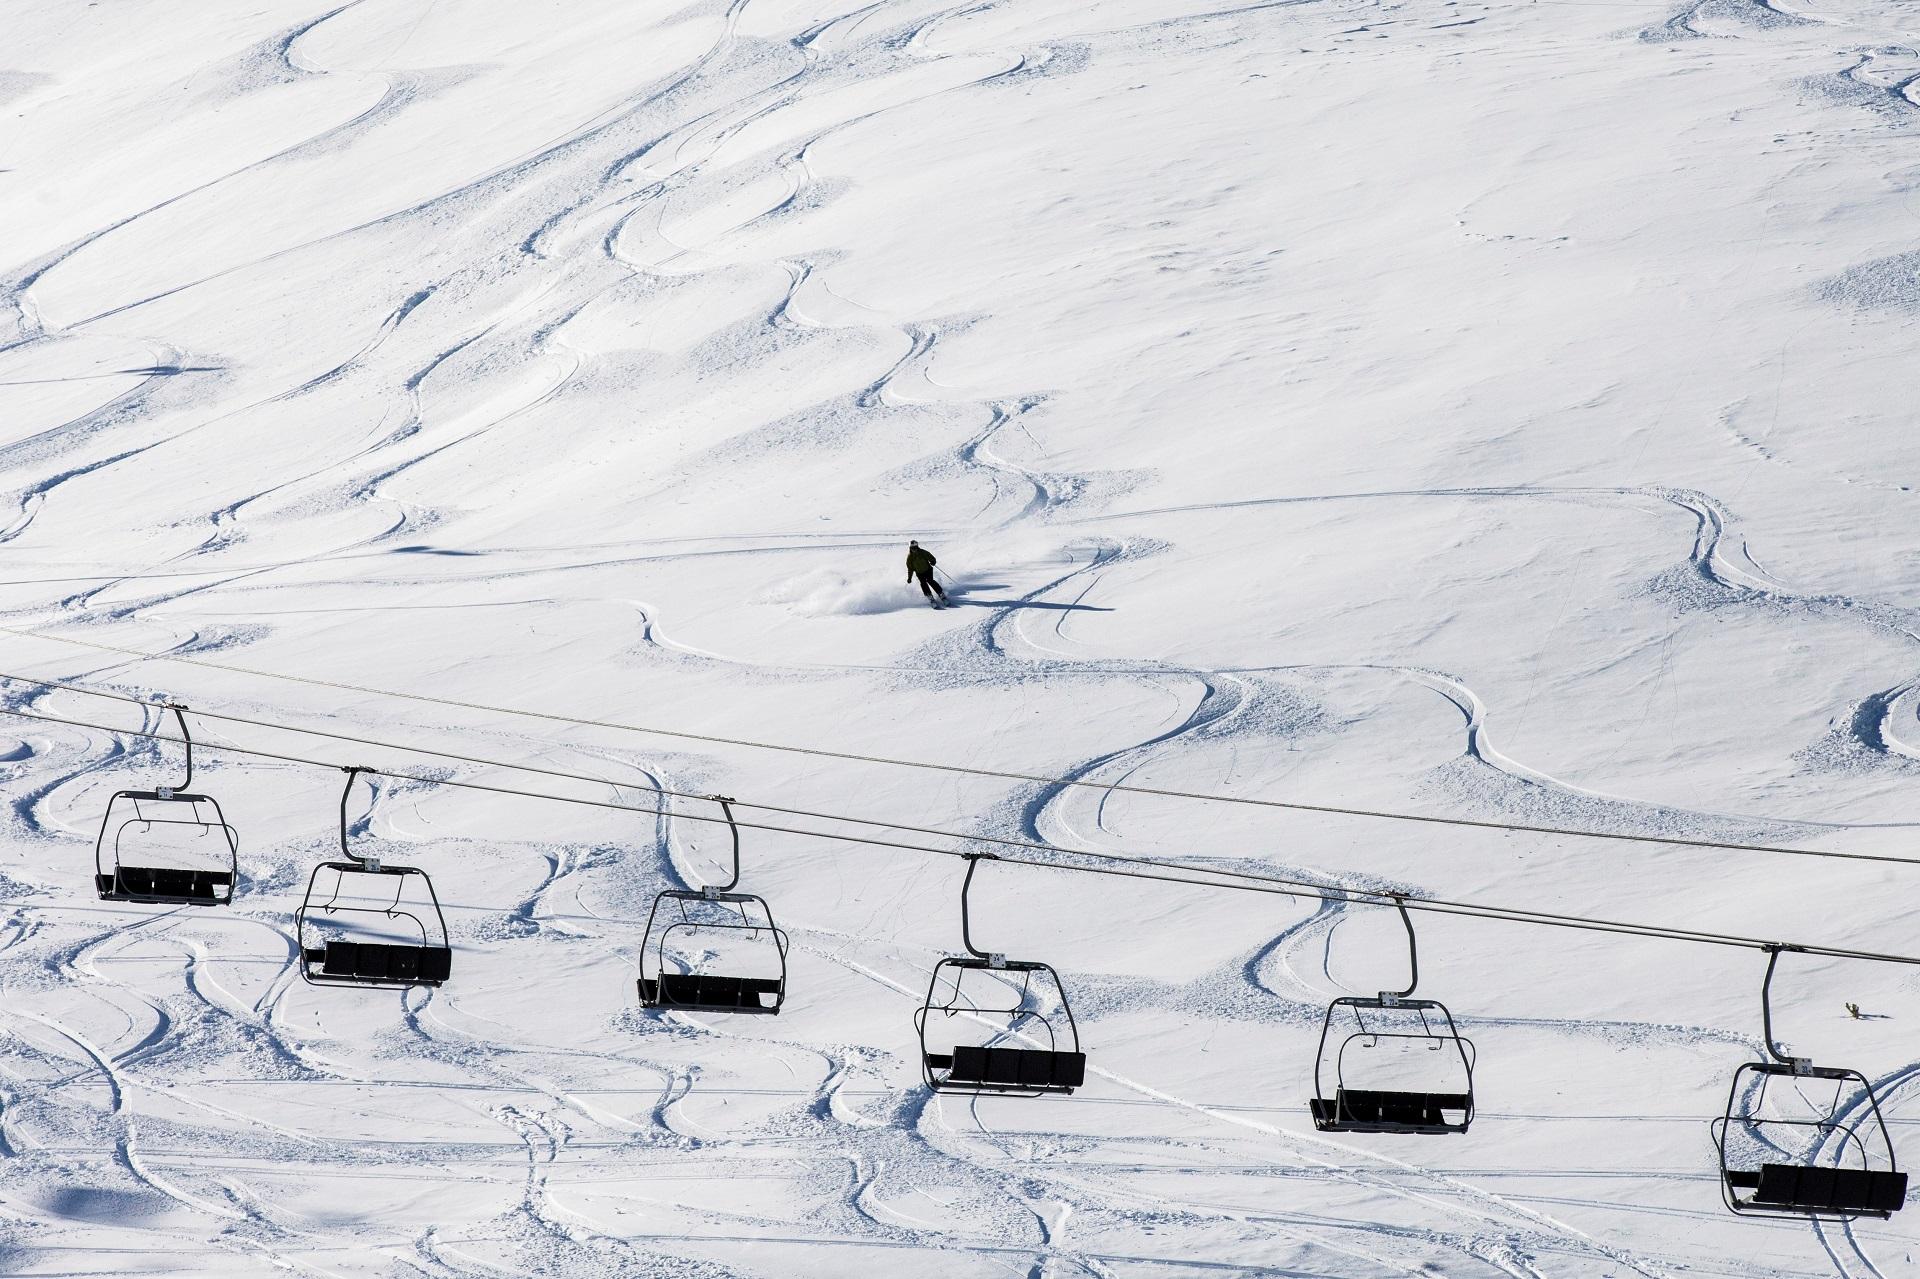 Entradas 8 Days  Ski Pass